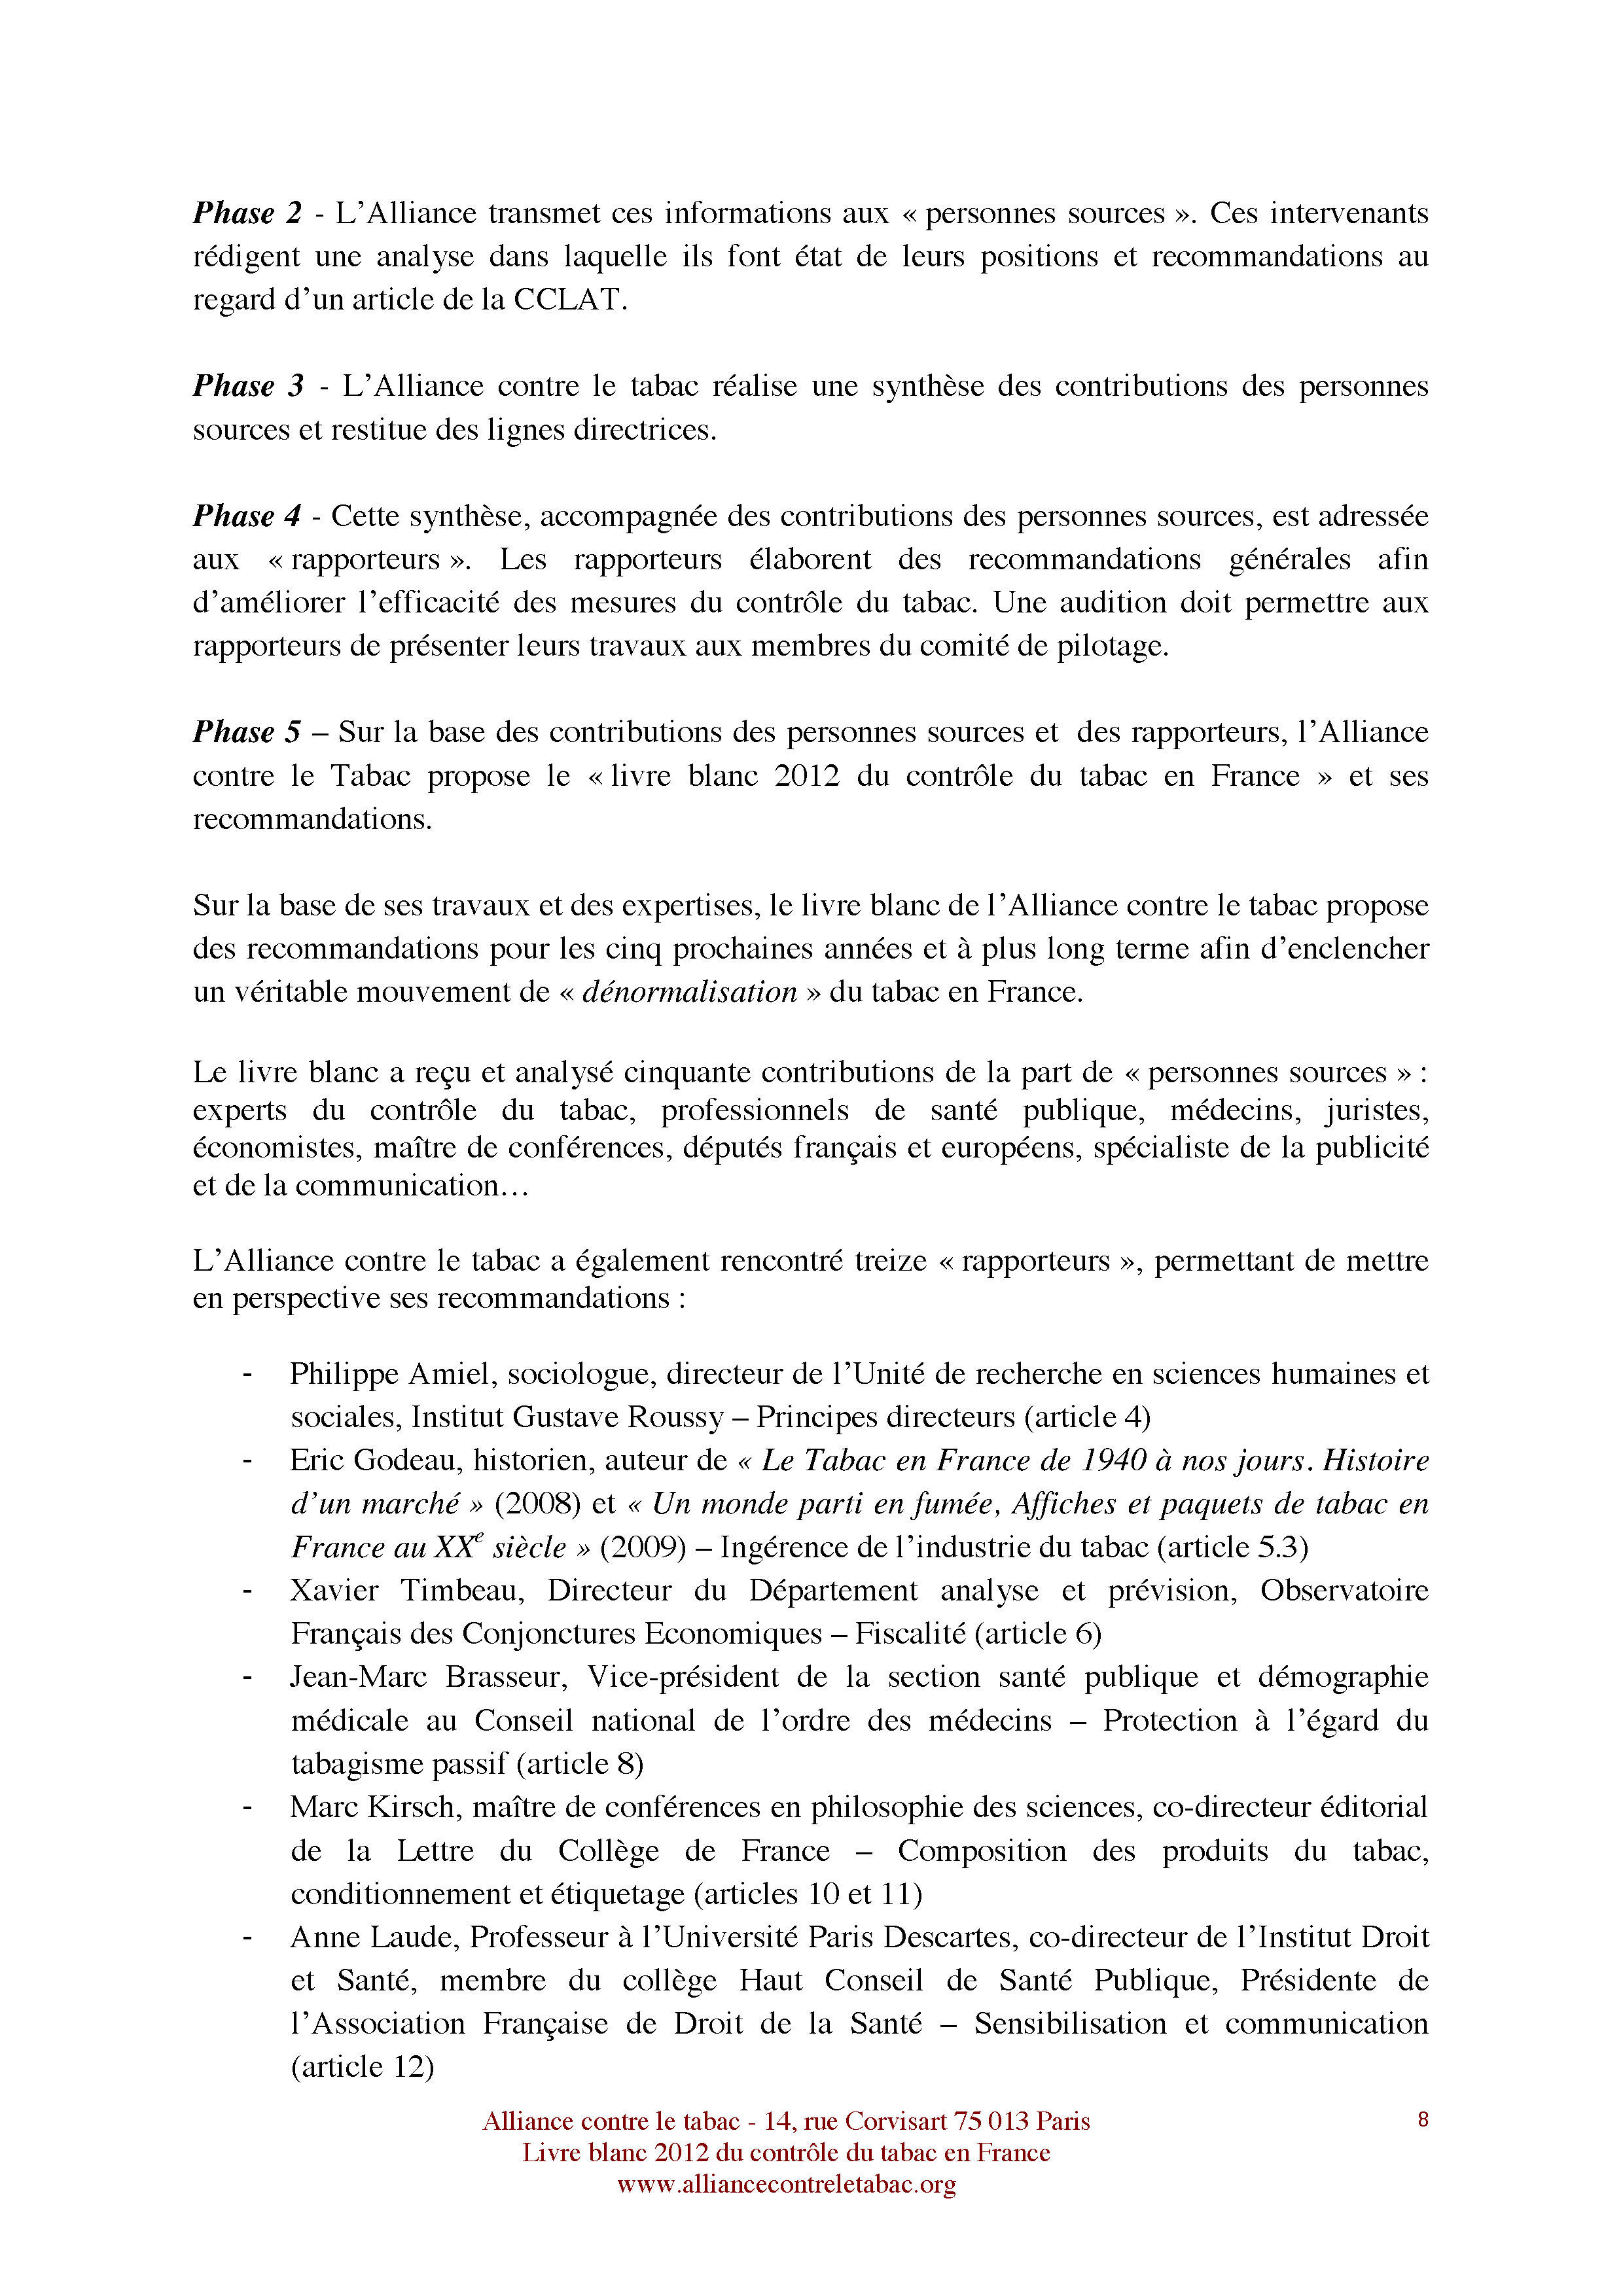 Alliance-dossier-presse_livre-blanc-22mars2012_Page_08.jpg